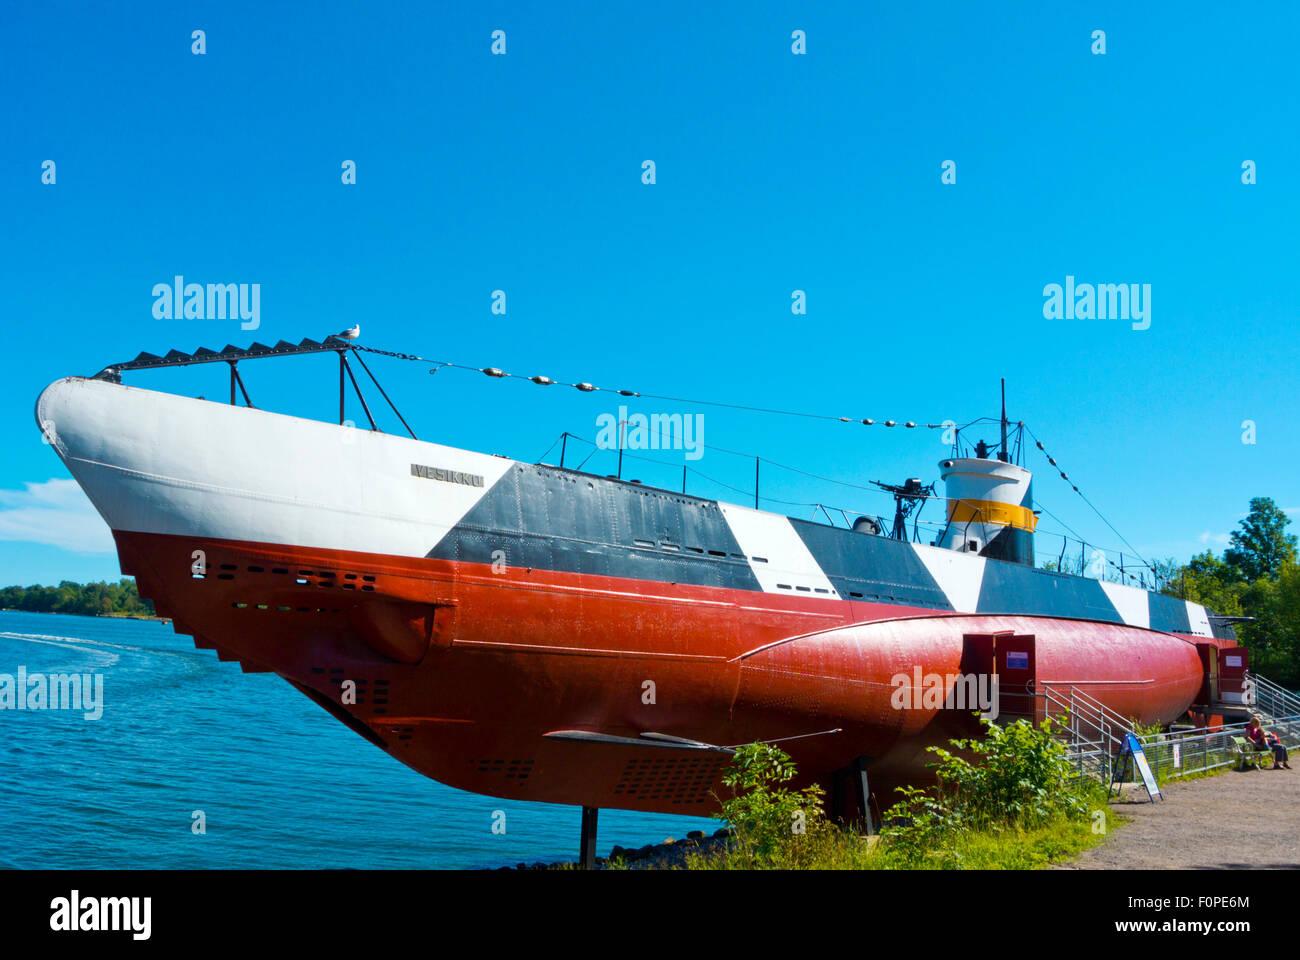 Vesikko, submarino, parte del Museo Marítimo, la fortaleza de Suomenlinna, Sveaborg, isla, Helsinki, Finlandia Imagen De Stock